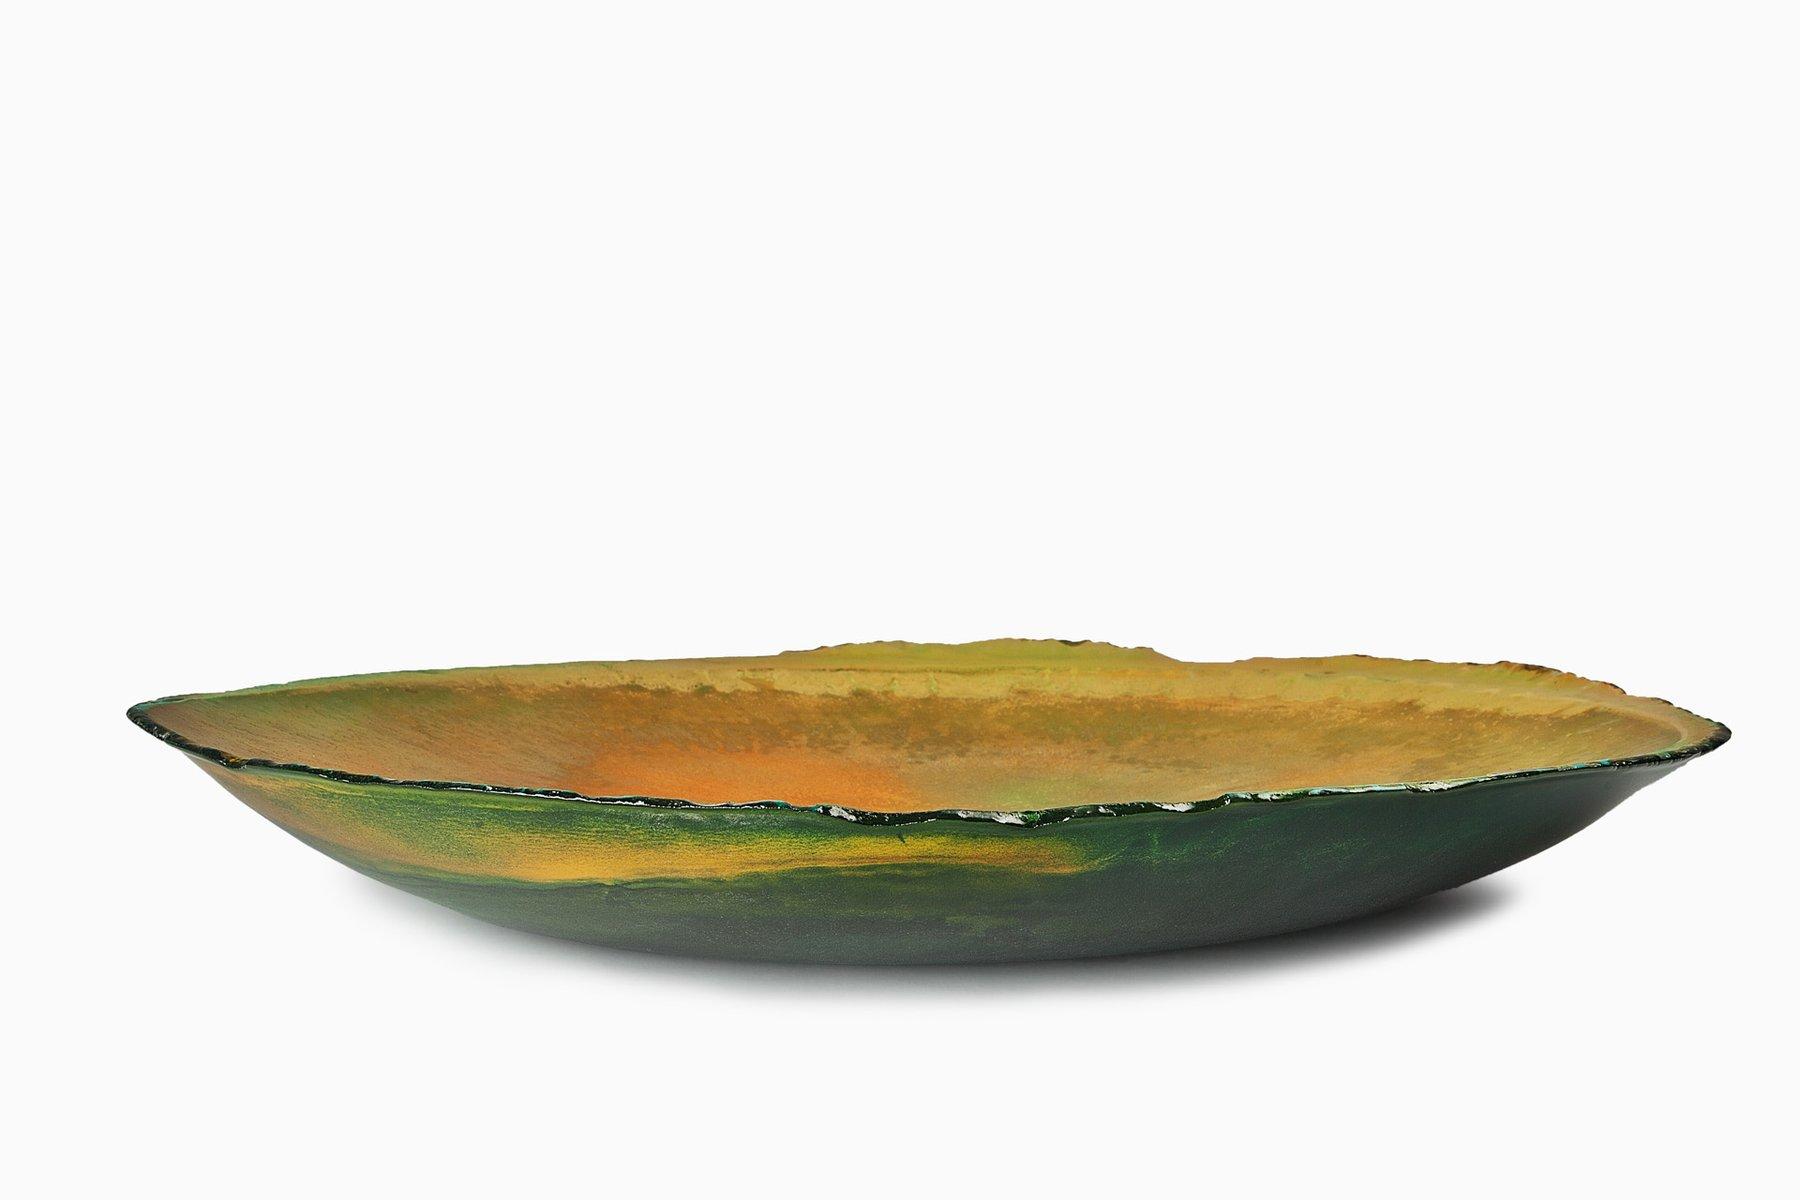 Balloon Bowl in Green by Maarten de Ceulaer bei Pamono kaufen